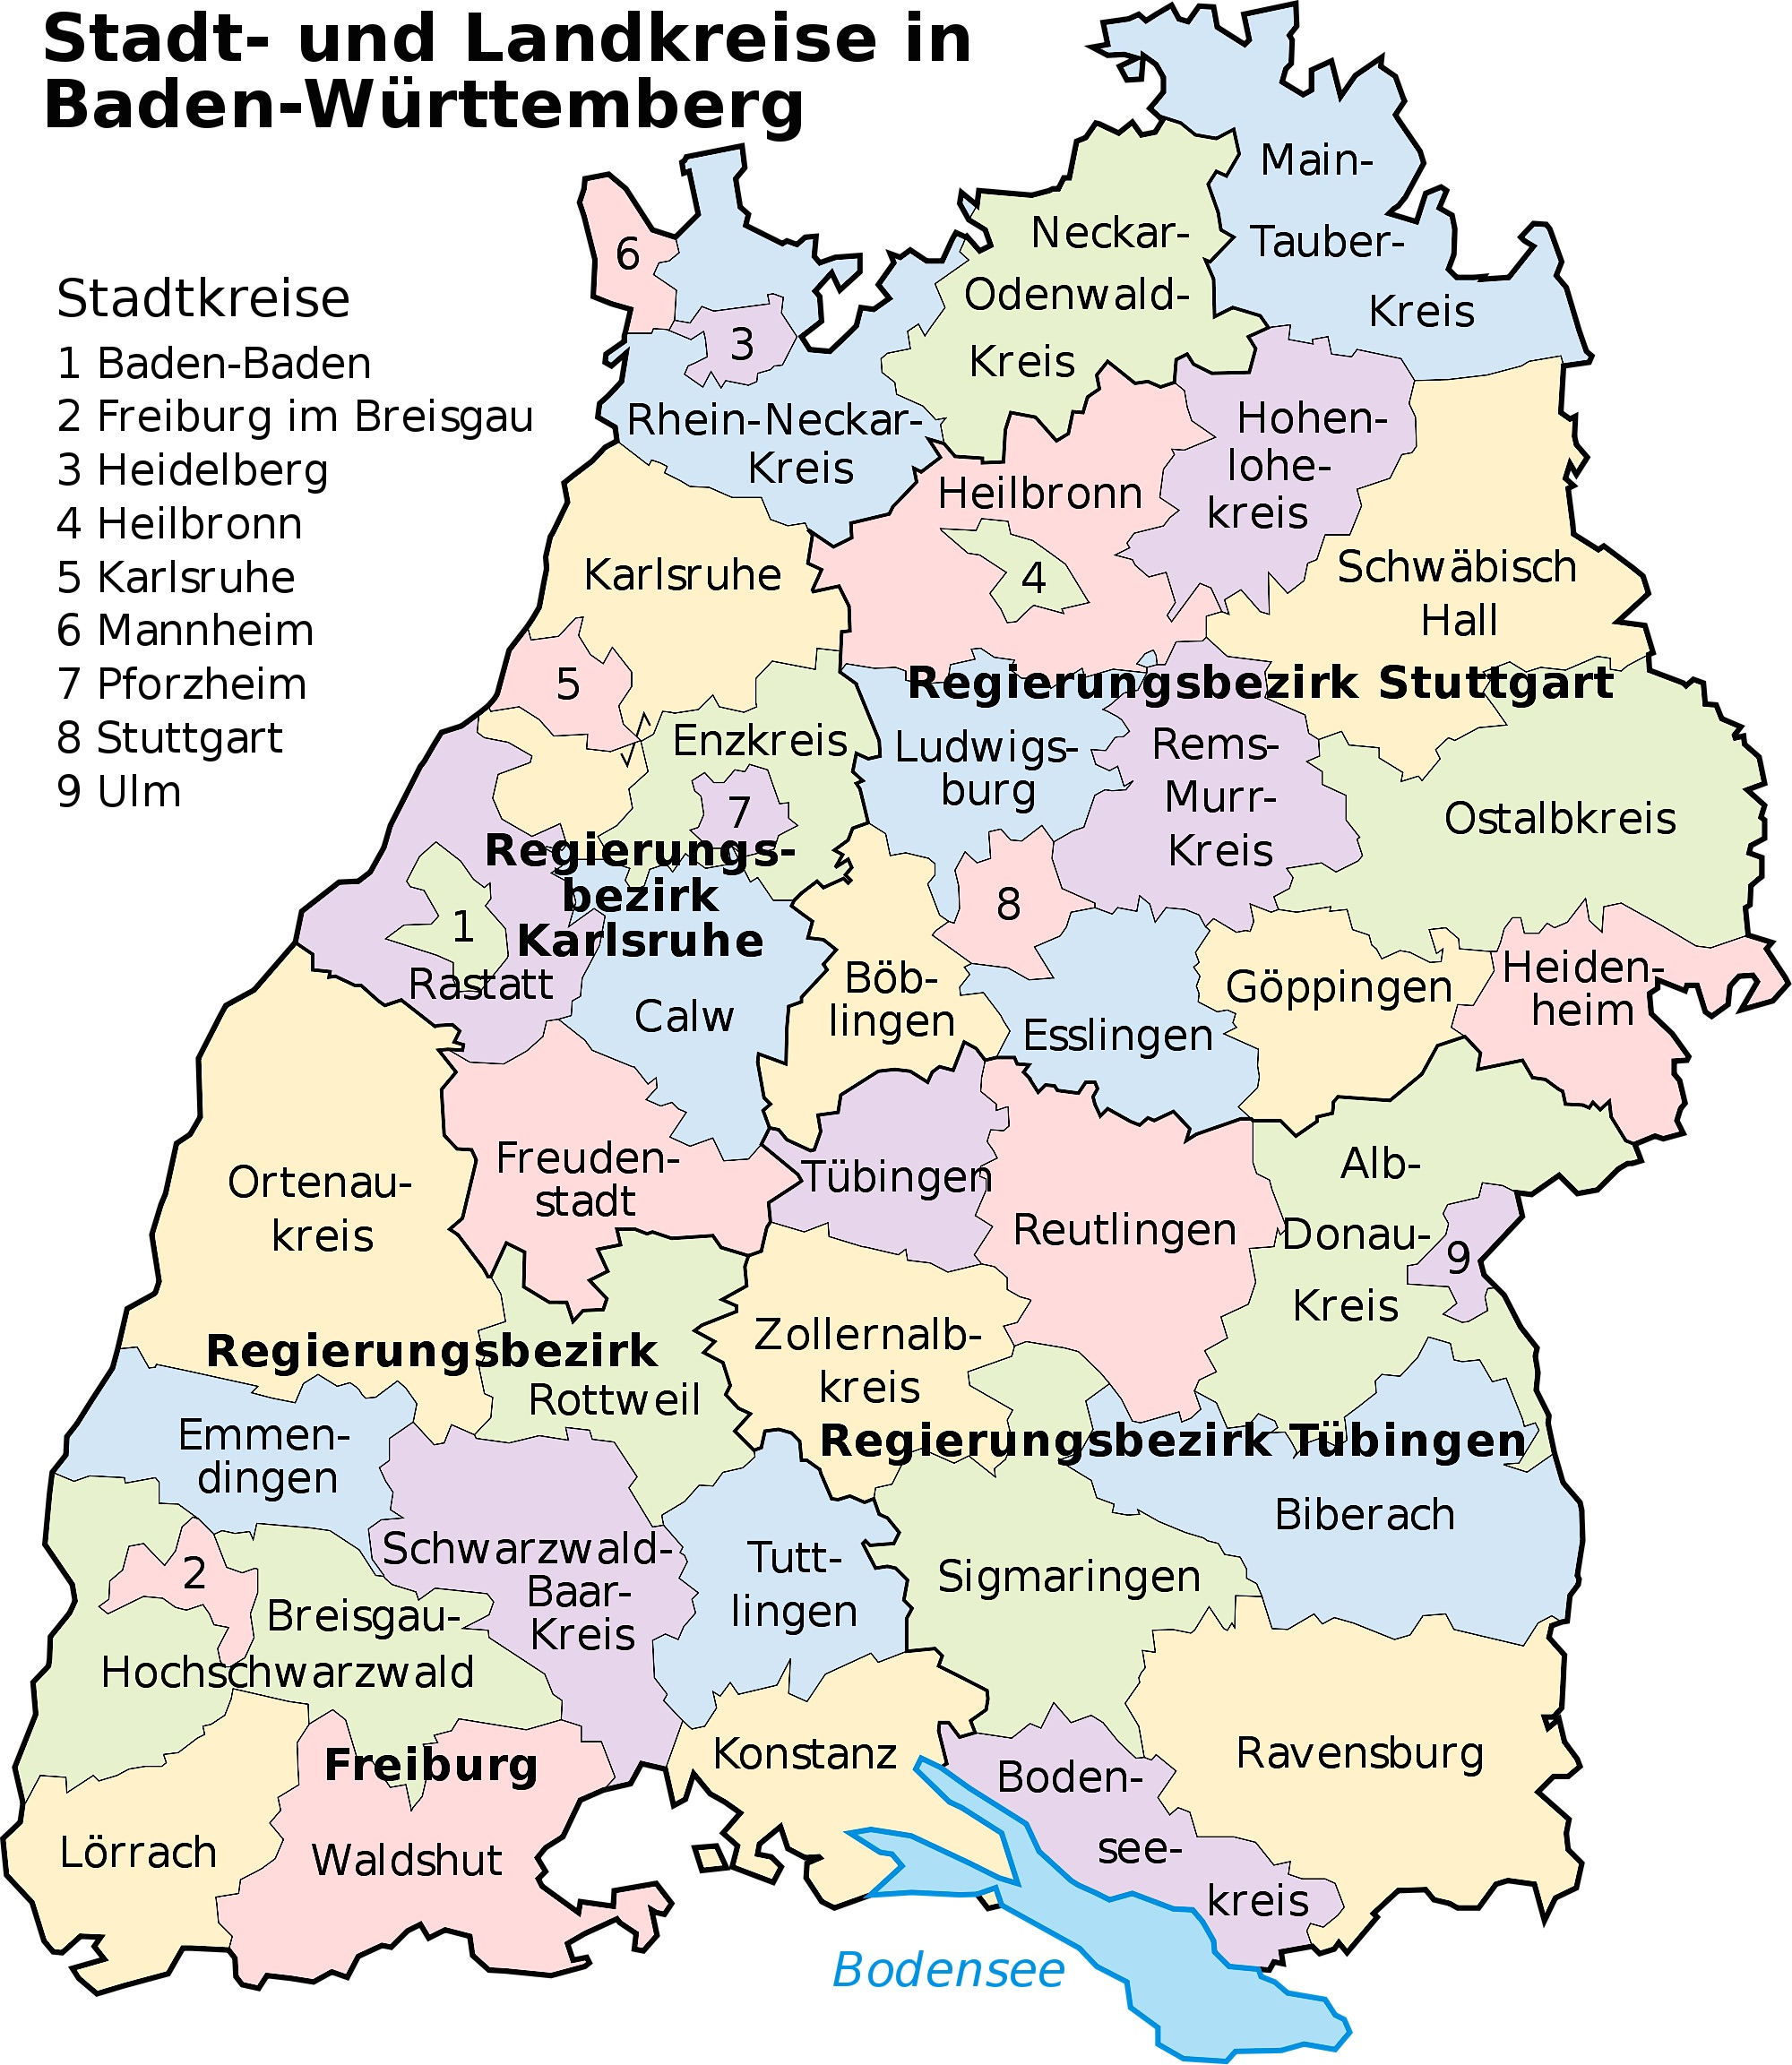 Baden-Württemberg, source wikimedia